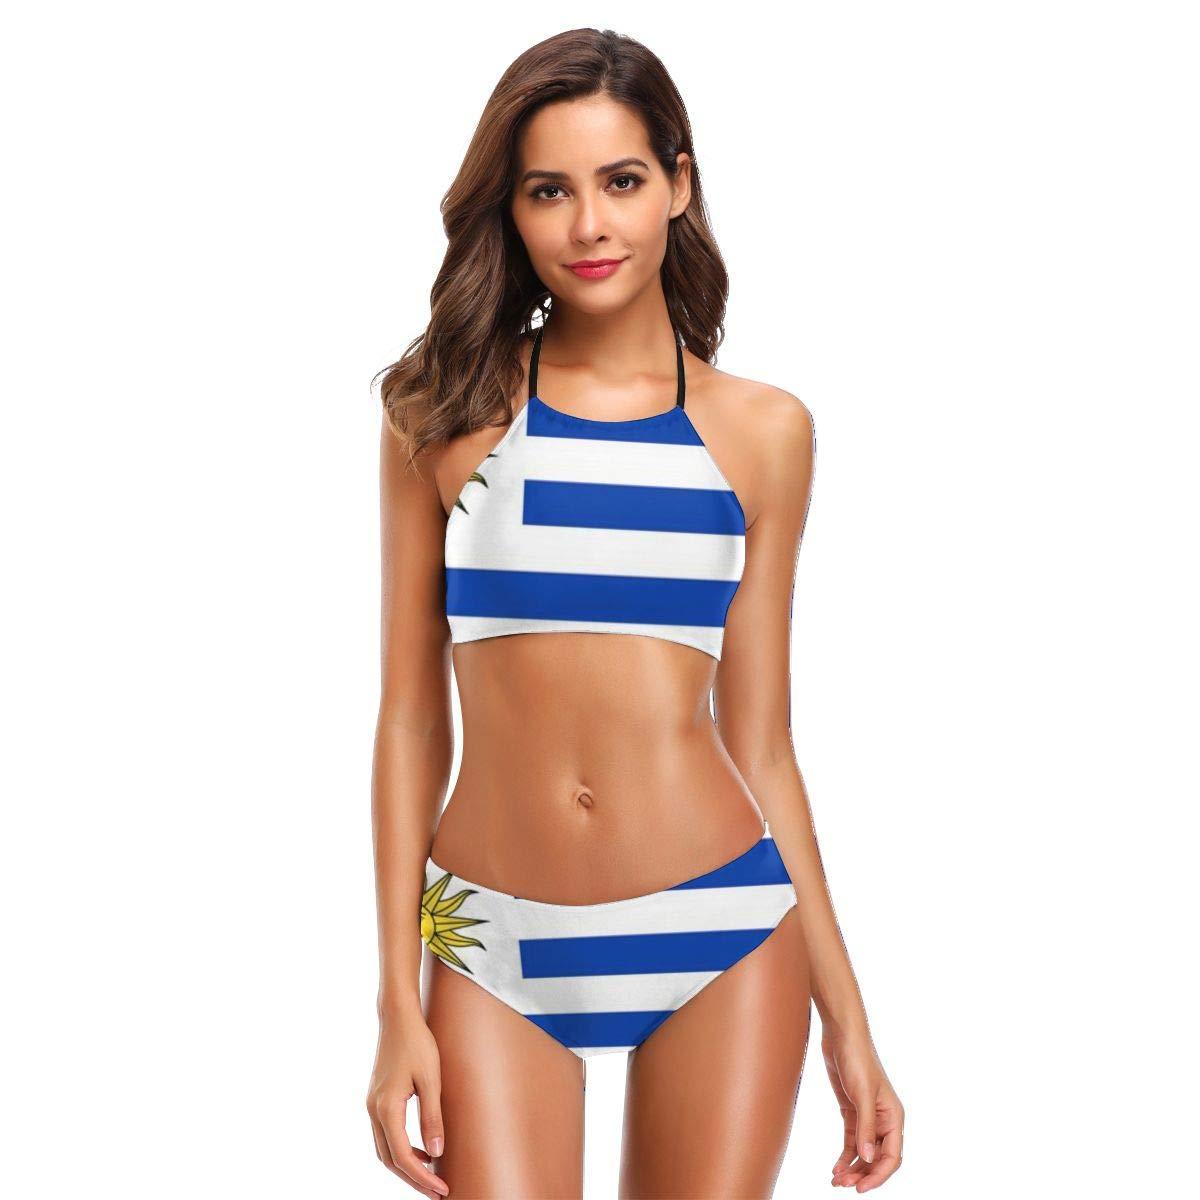 Women's Halter Bikini Set Uruguay Flag Beach Swimsuit Padded Bathing Suit